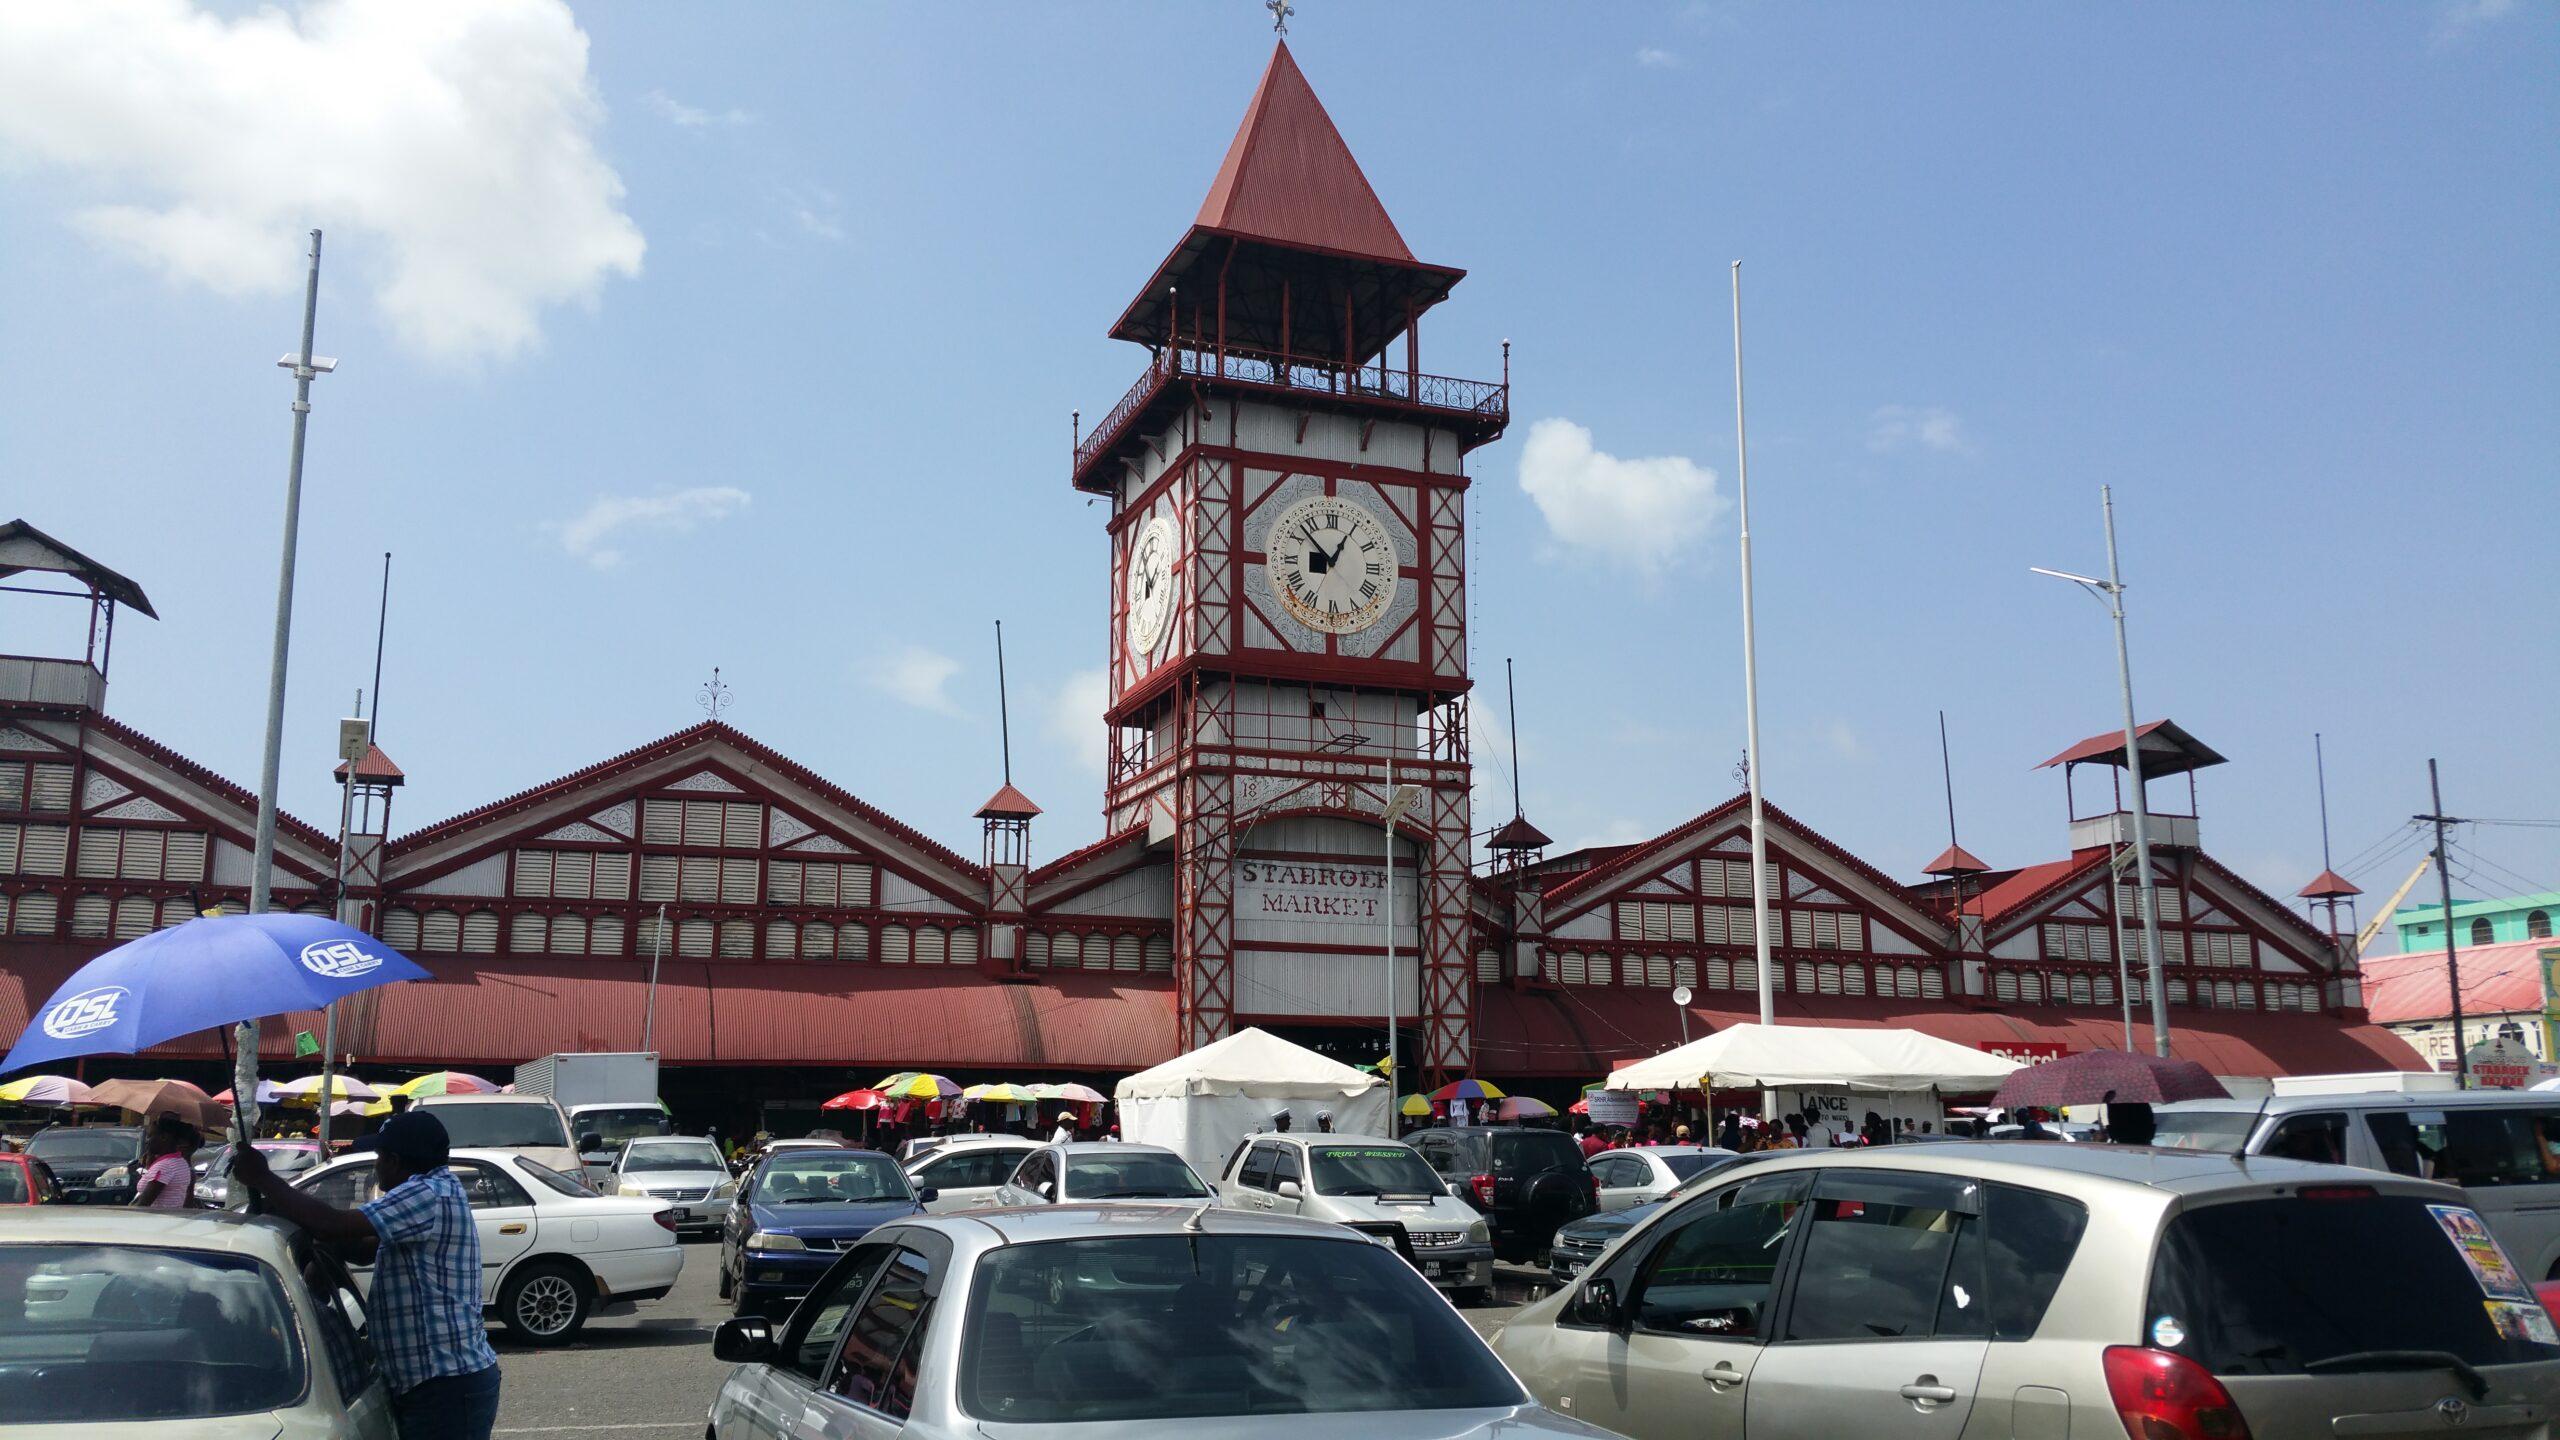 The Stabroek Market in Georgetown, Guyana